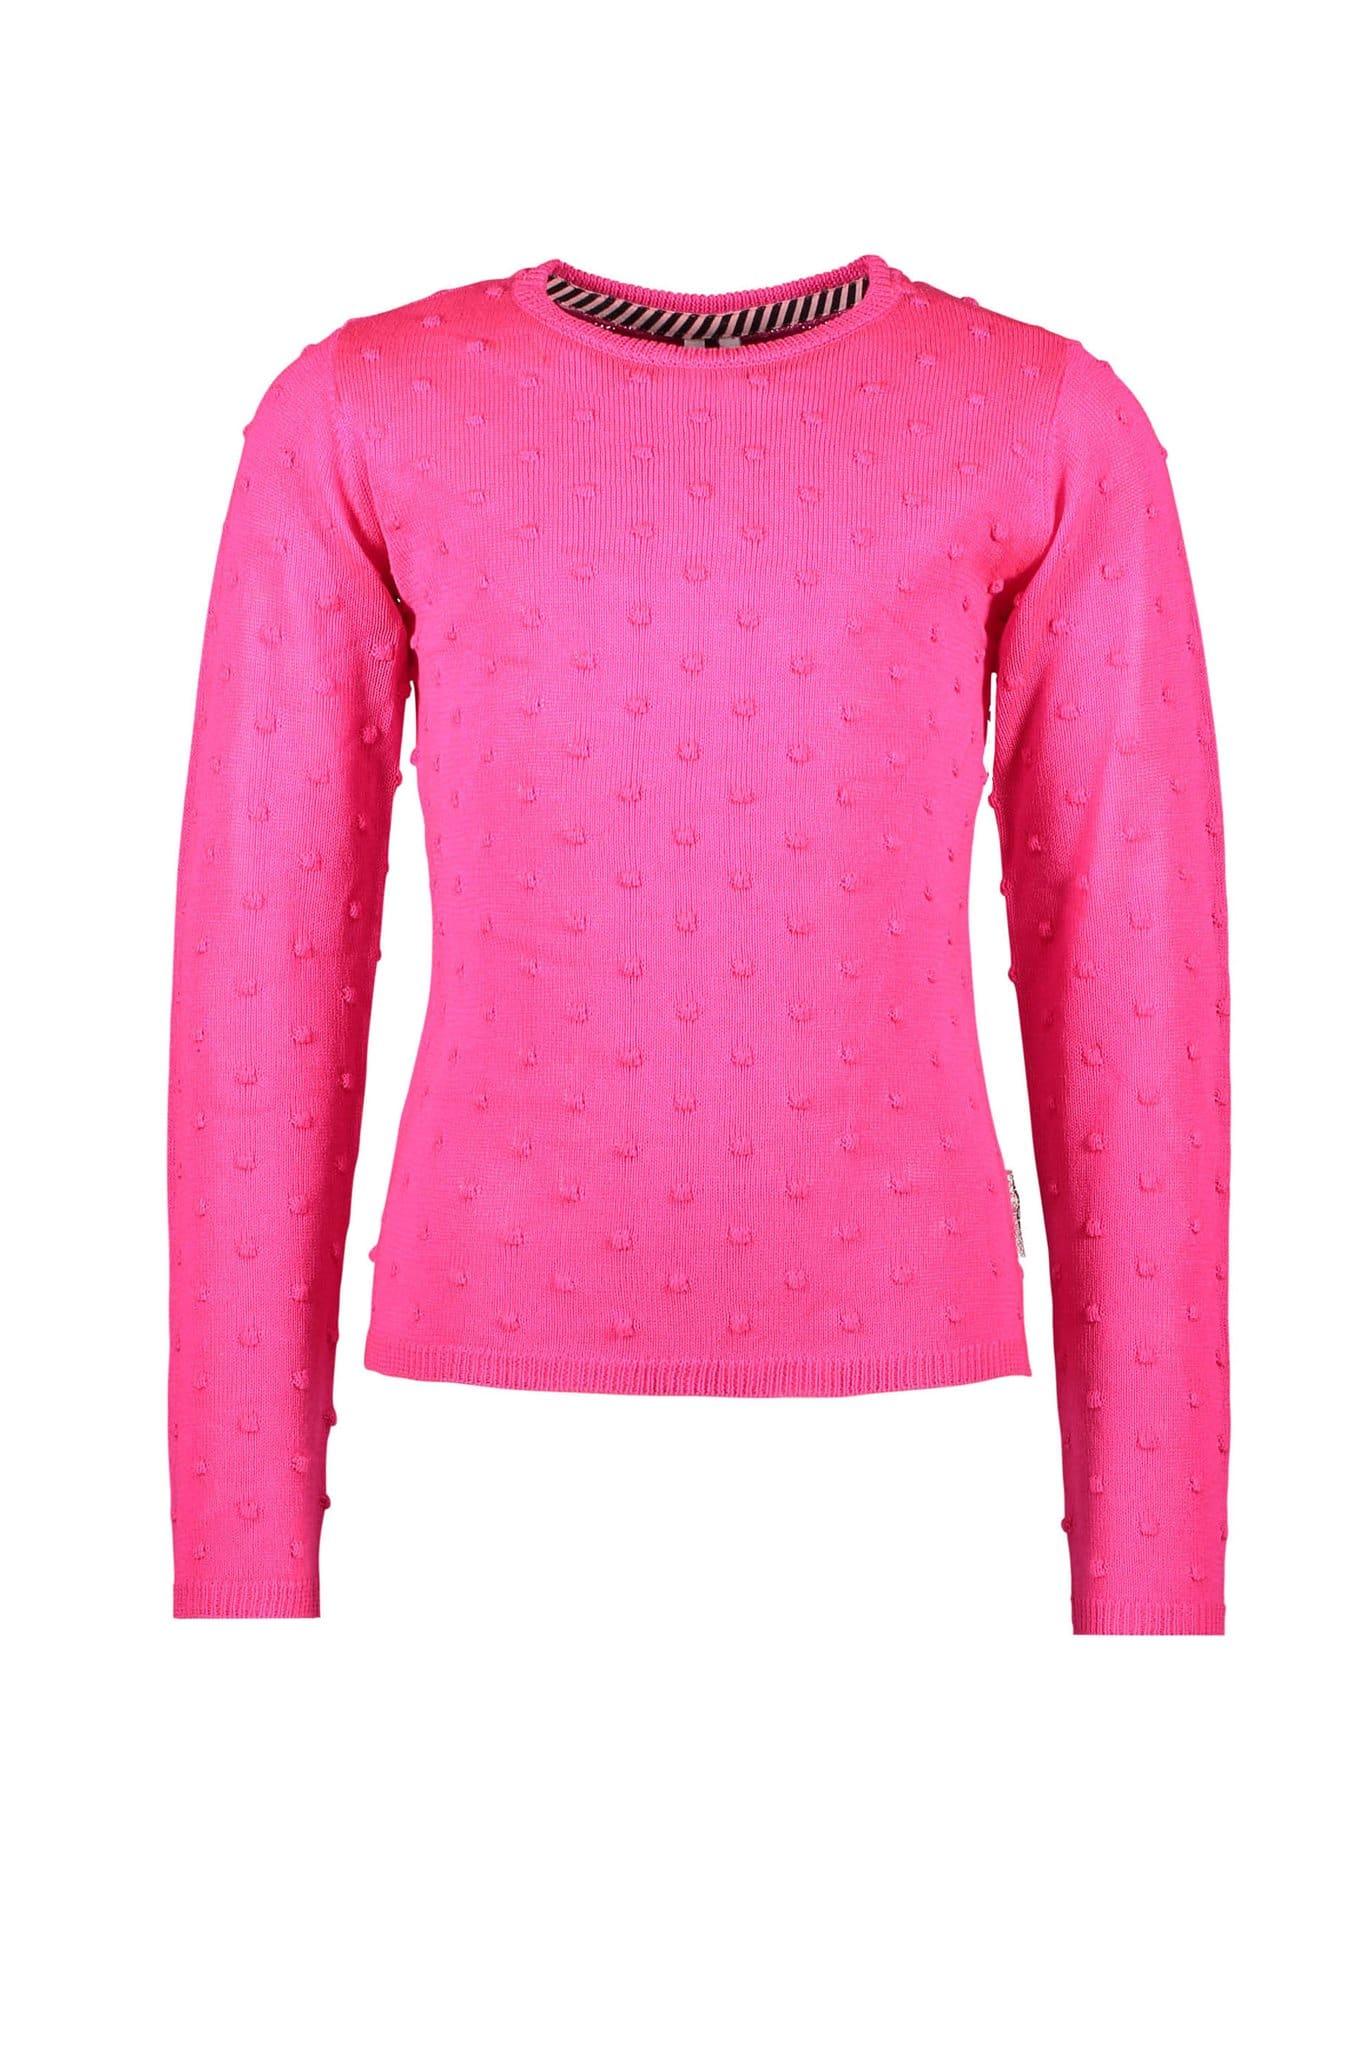 B.NOSY Fine knitted trui